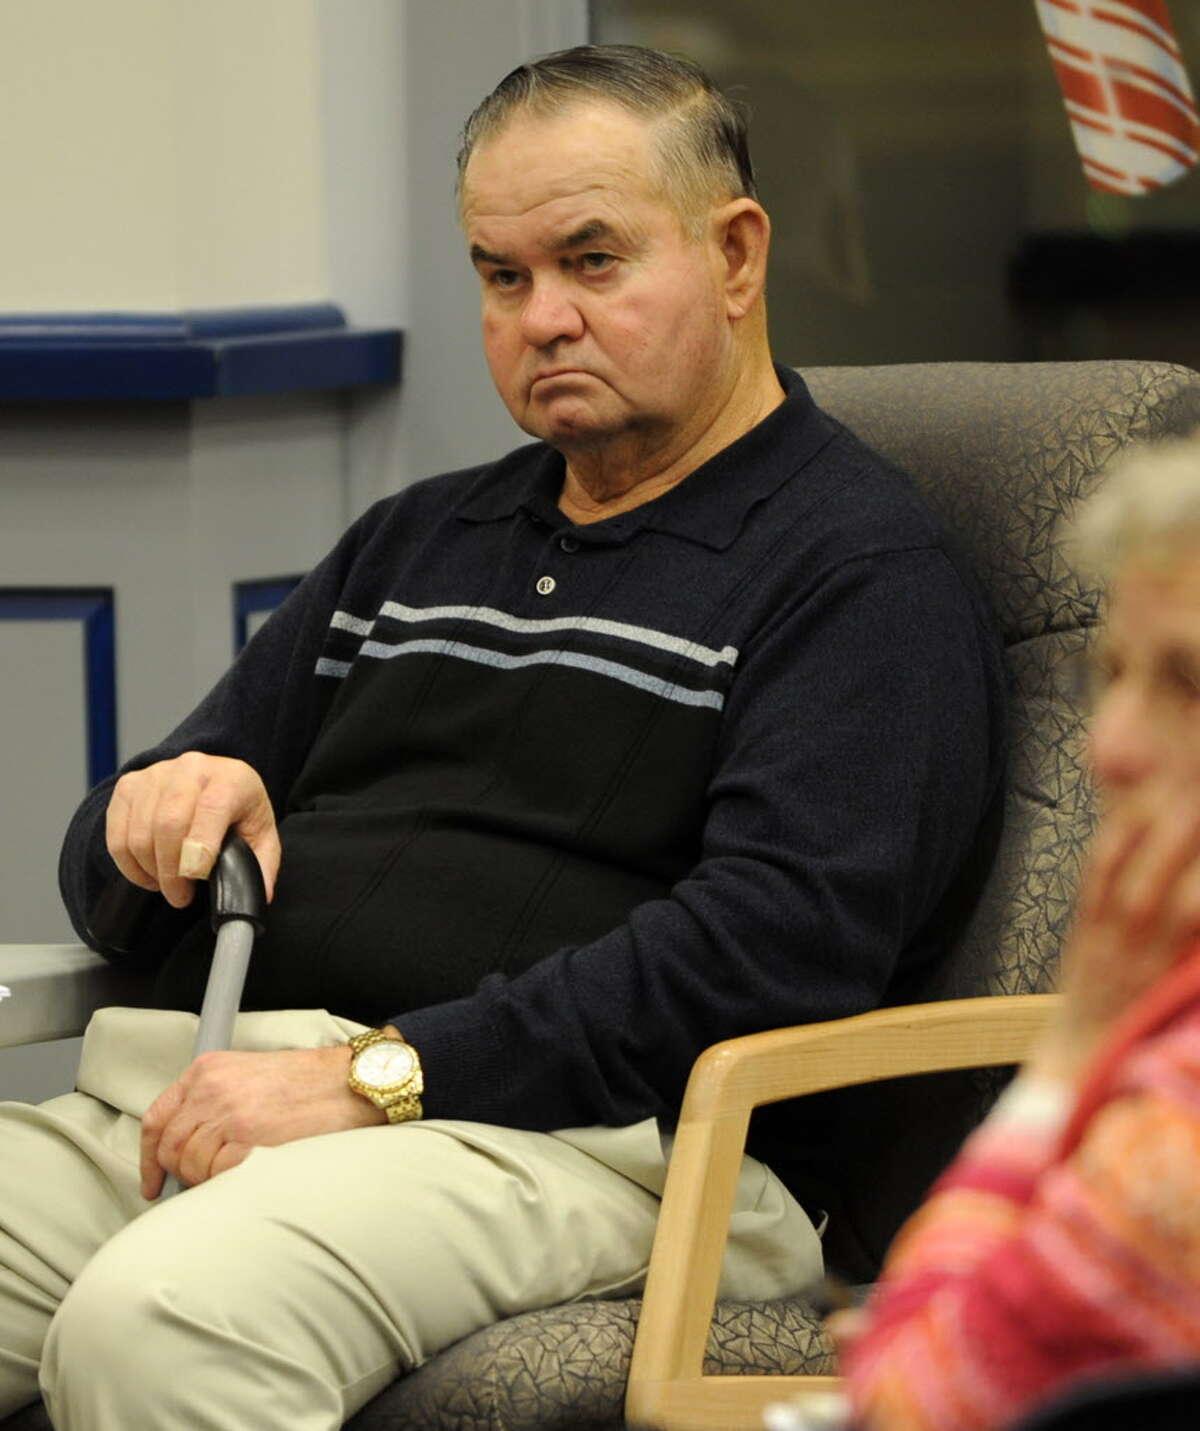 Walter Polak listens during a Halfmoon planning board meeting in December. Polak died Wednesday. (Lori Van Buren / Times Union archive)